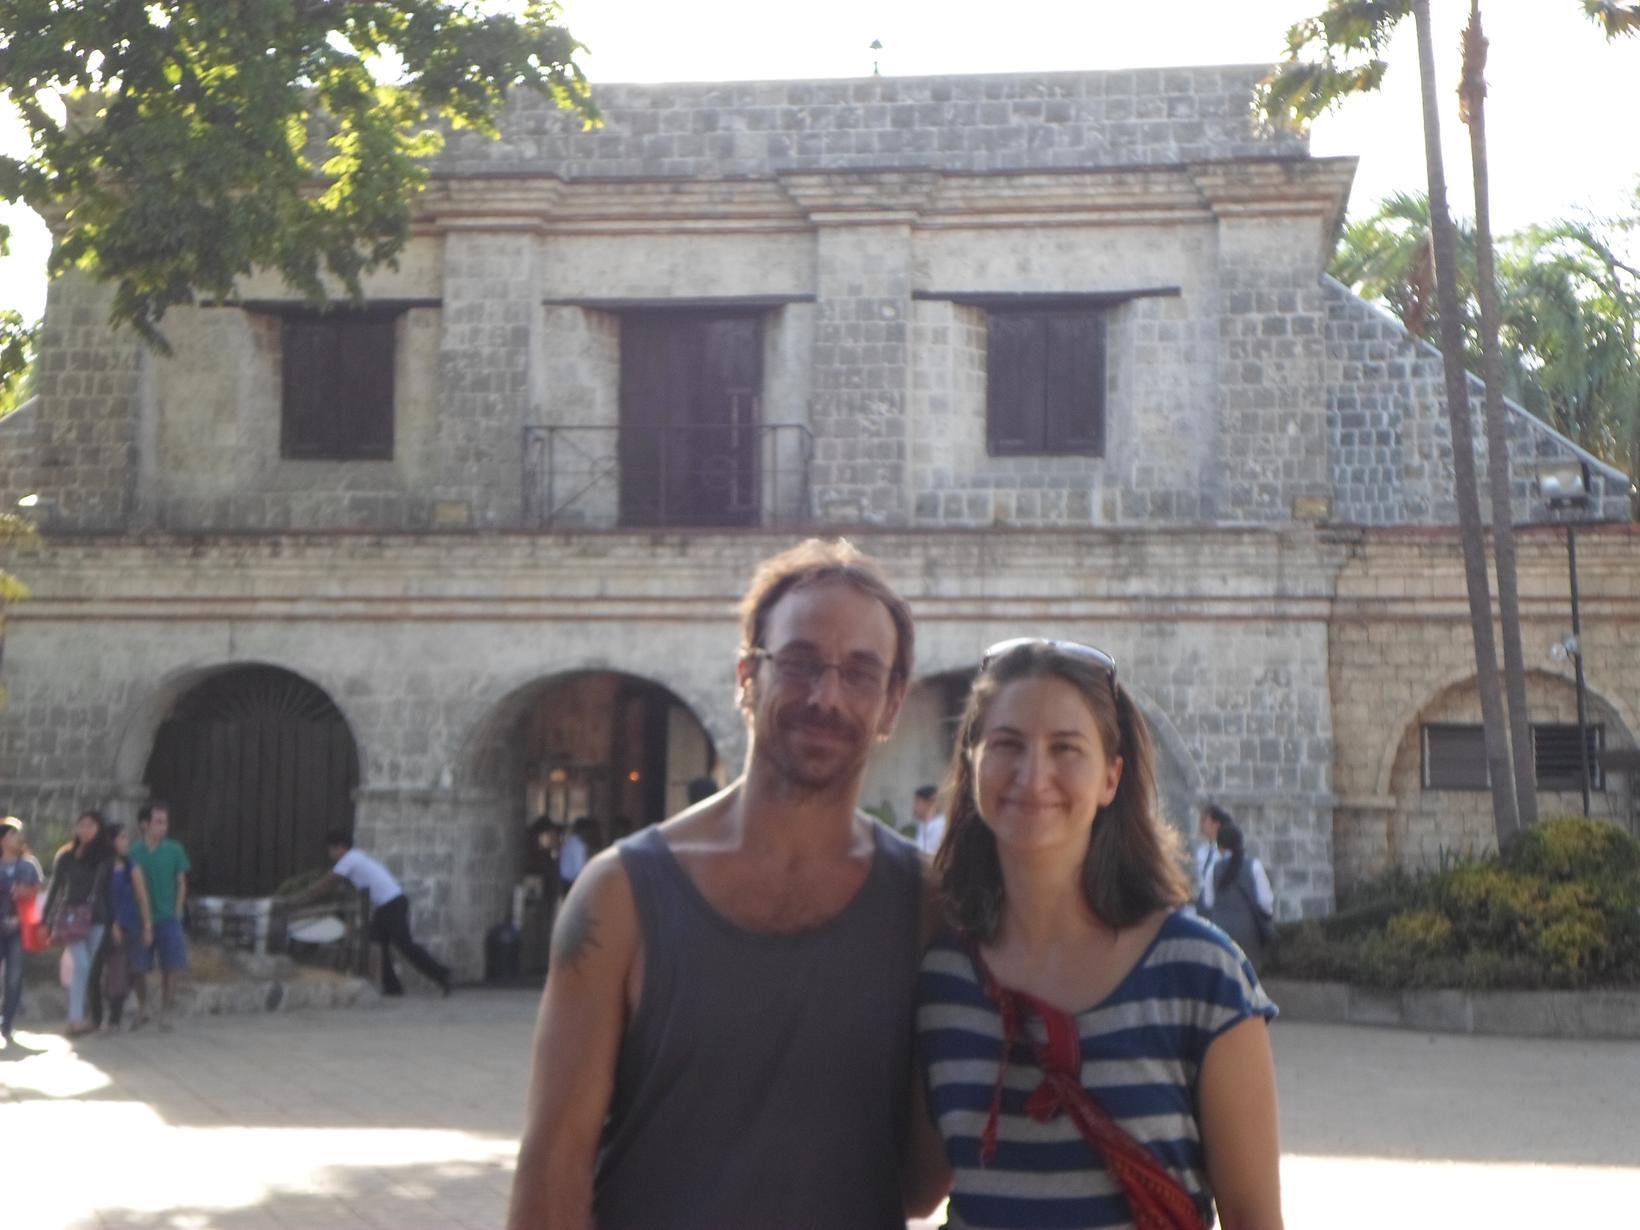 Genevieve & Mathieu from Montréal, Quebec, Canada